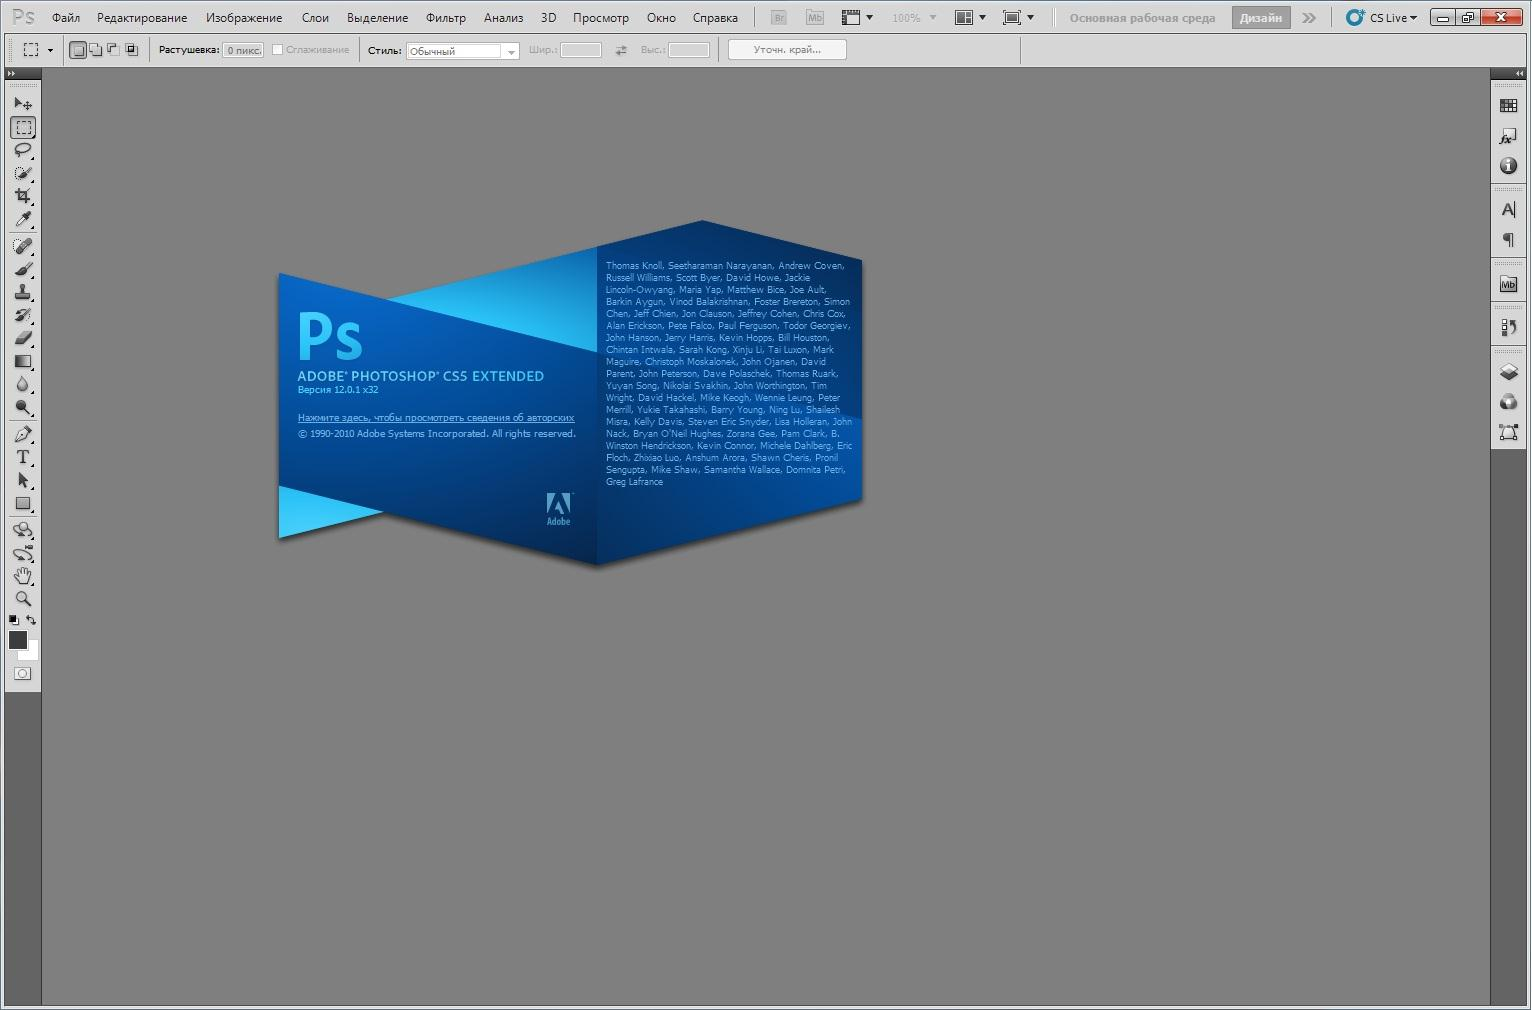 Adobe photoshop cs5 extended 12. 0 final (2010) рс » ckopo. Net.